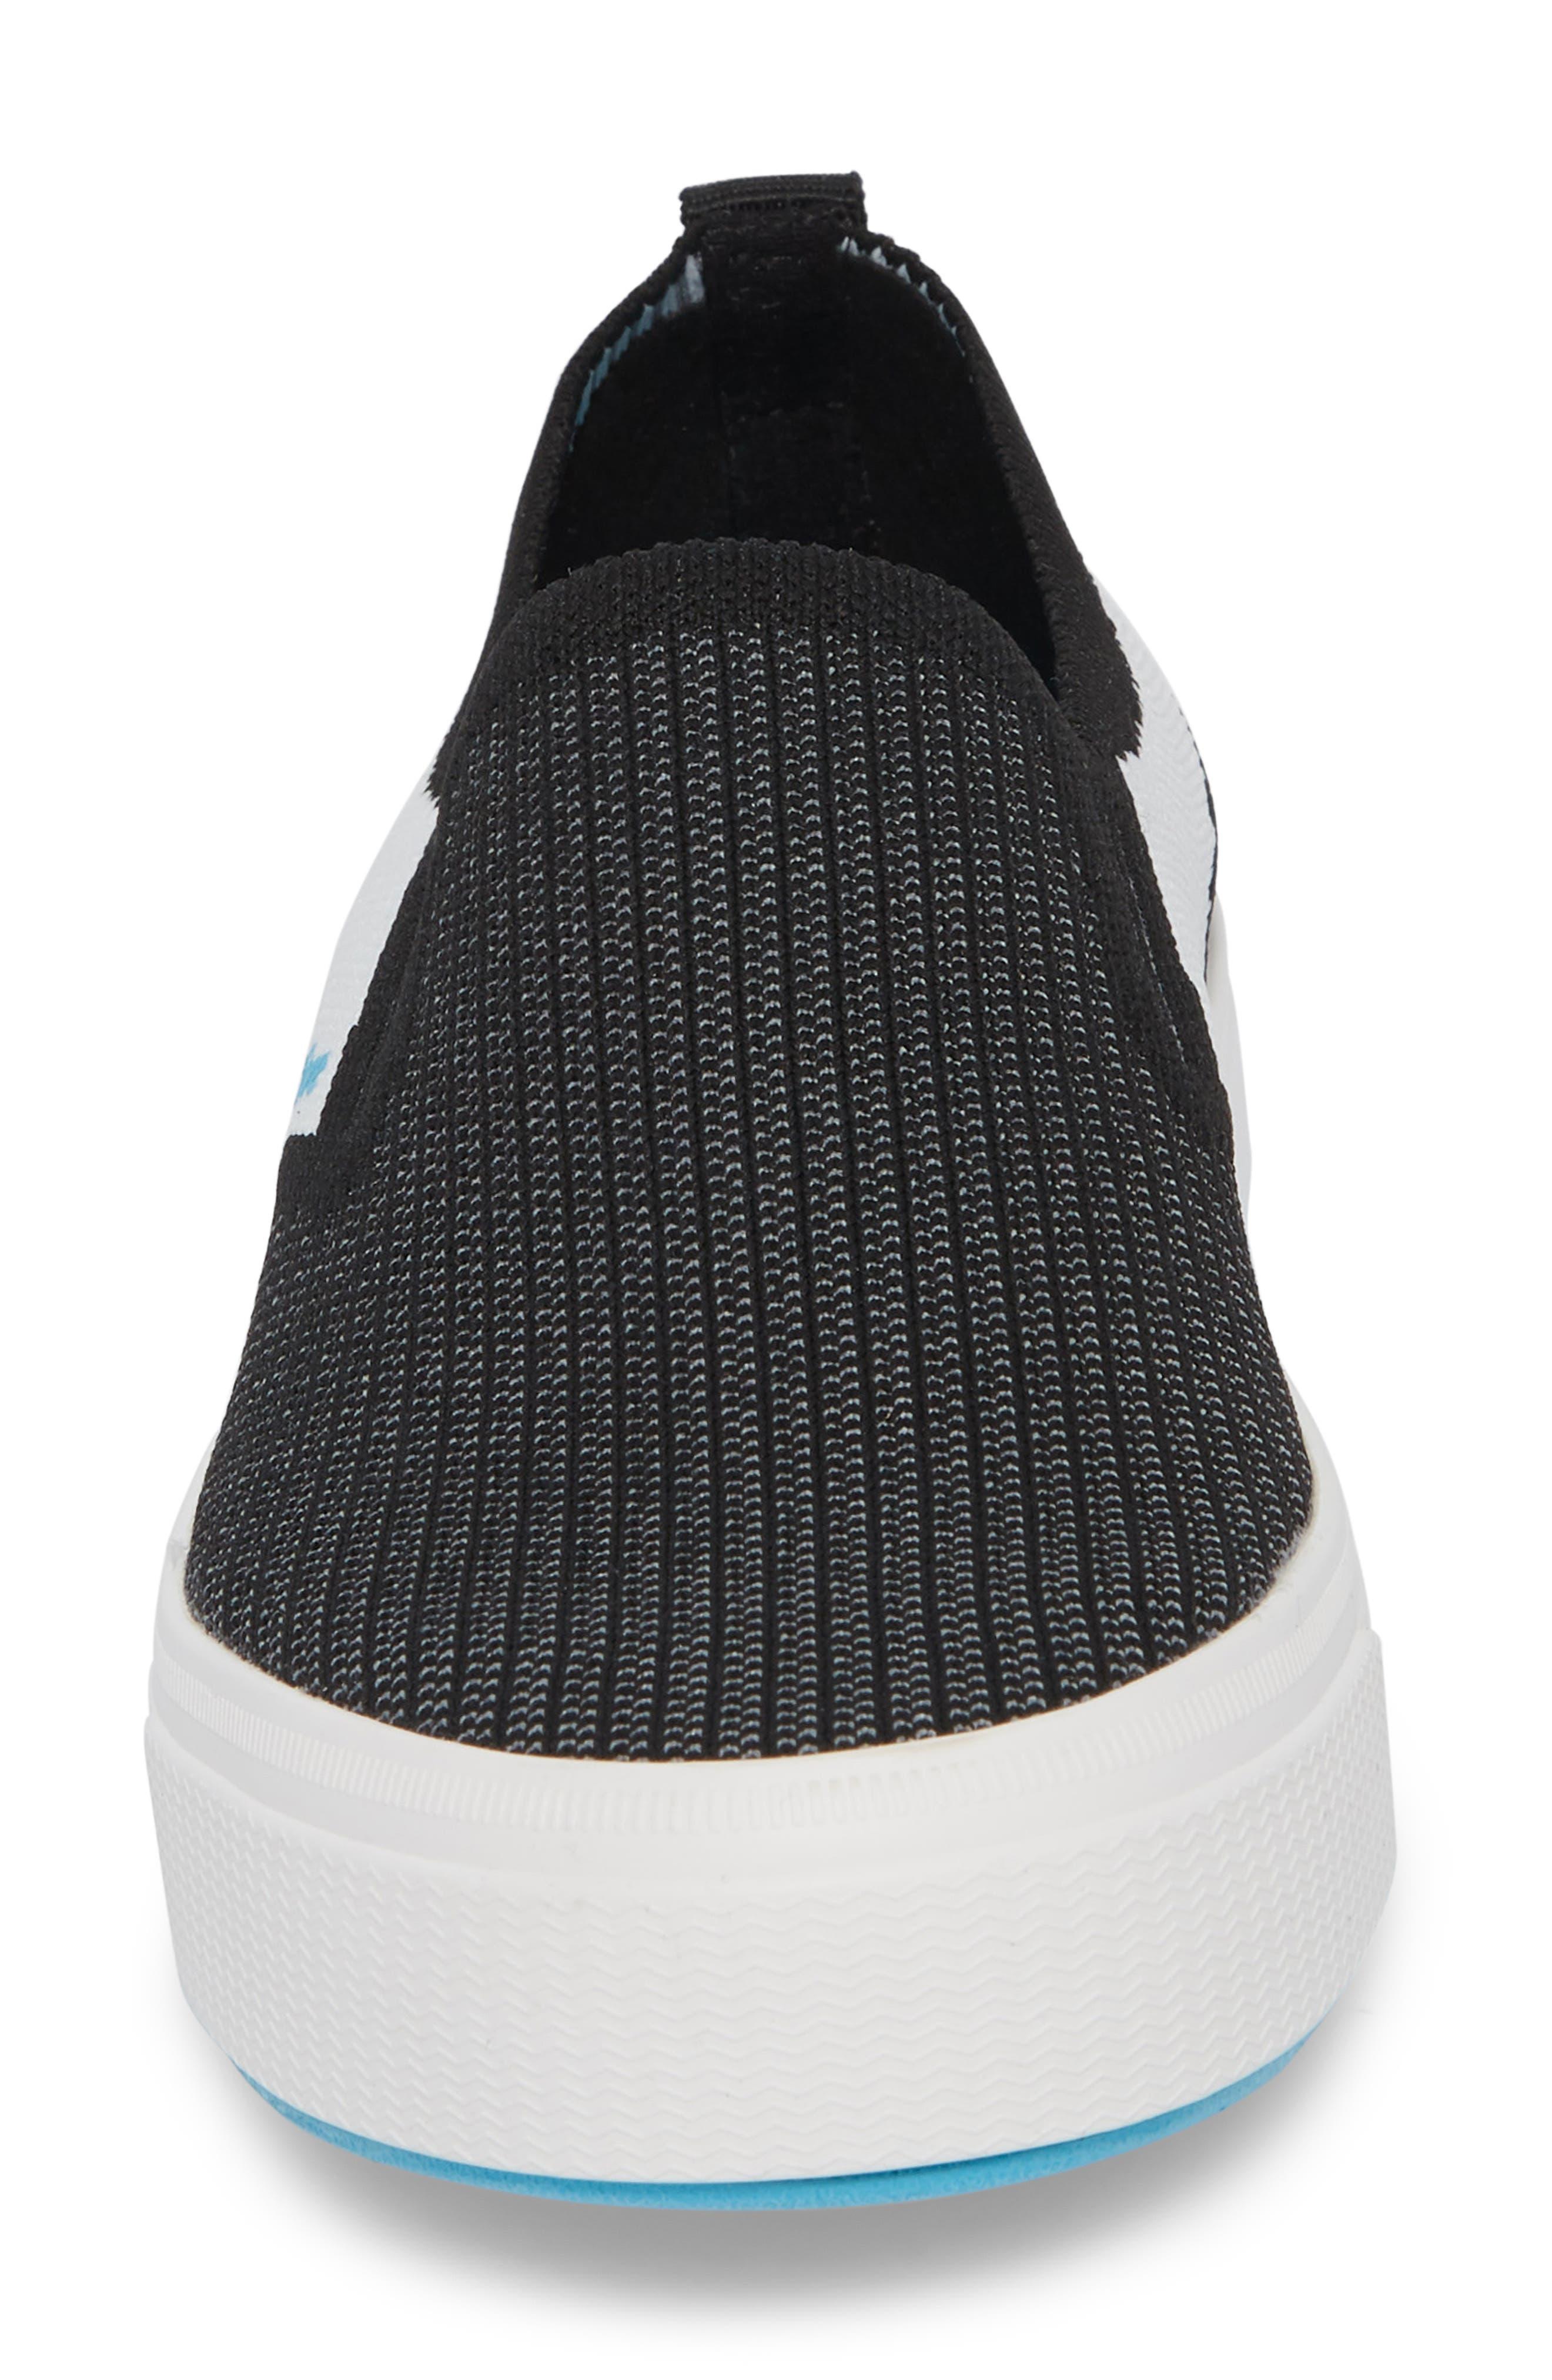 Miles Liteknit Slip-On Sneaker,                             Alternate thumbnail 4, color,                             JIFFY BLACK/ SHELL WHITE